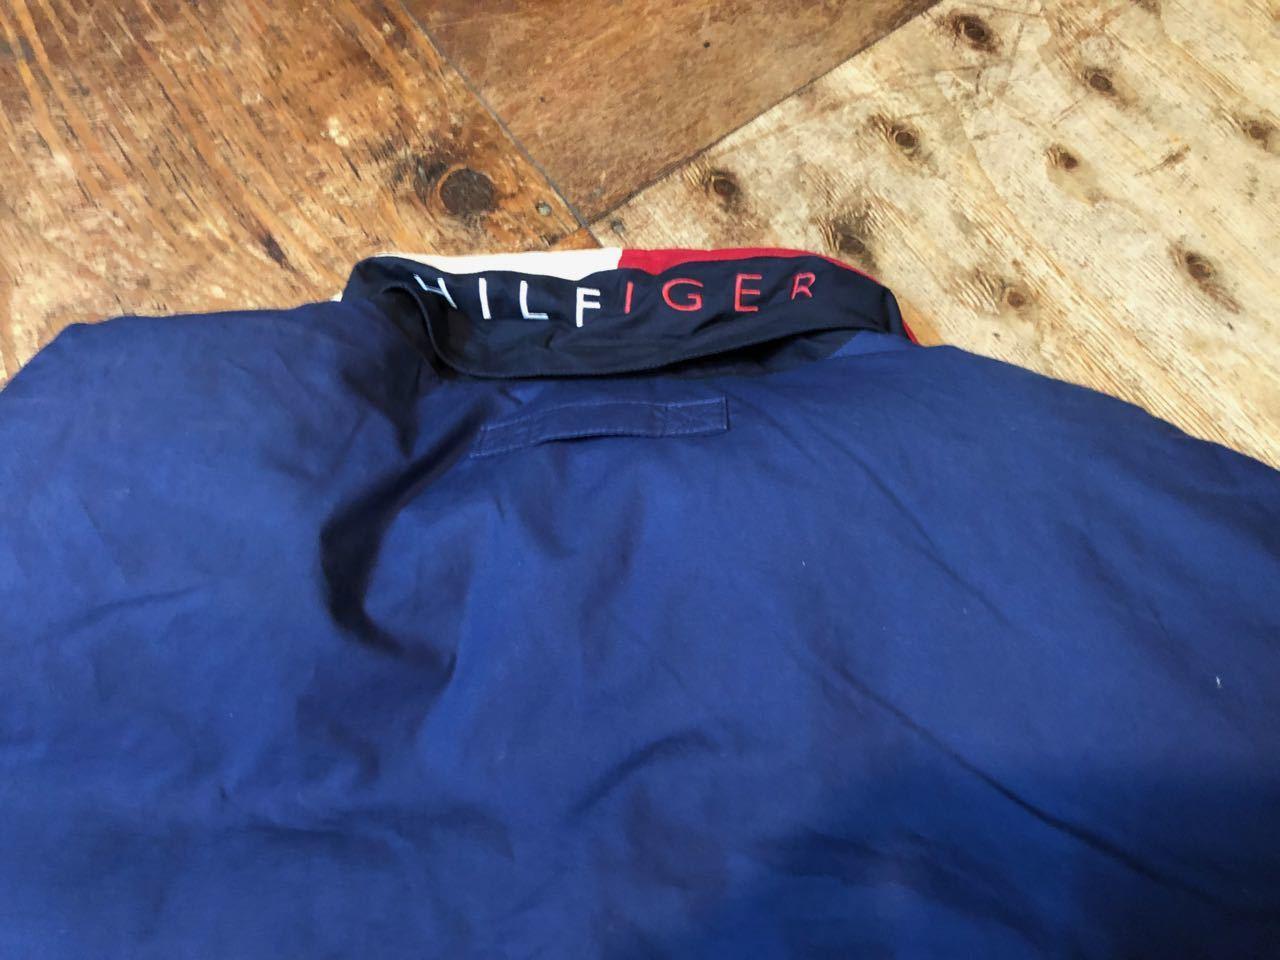 90s TOMMY HILFIGER DOWN JACKET  トミーフィルフィガー ダウンジャケット!_c0144020_14081576.jpg